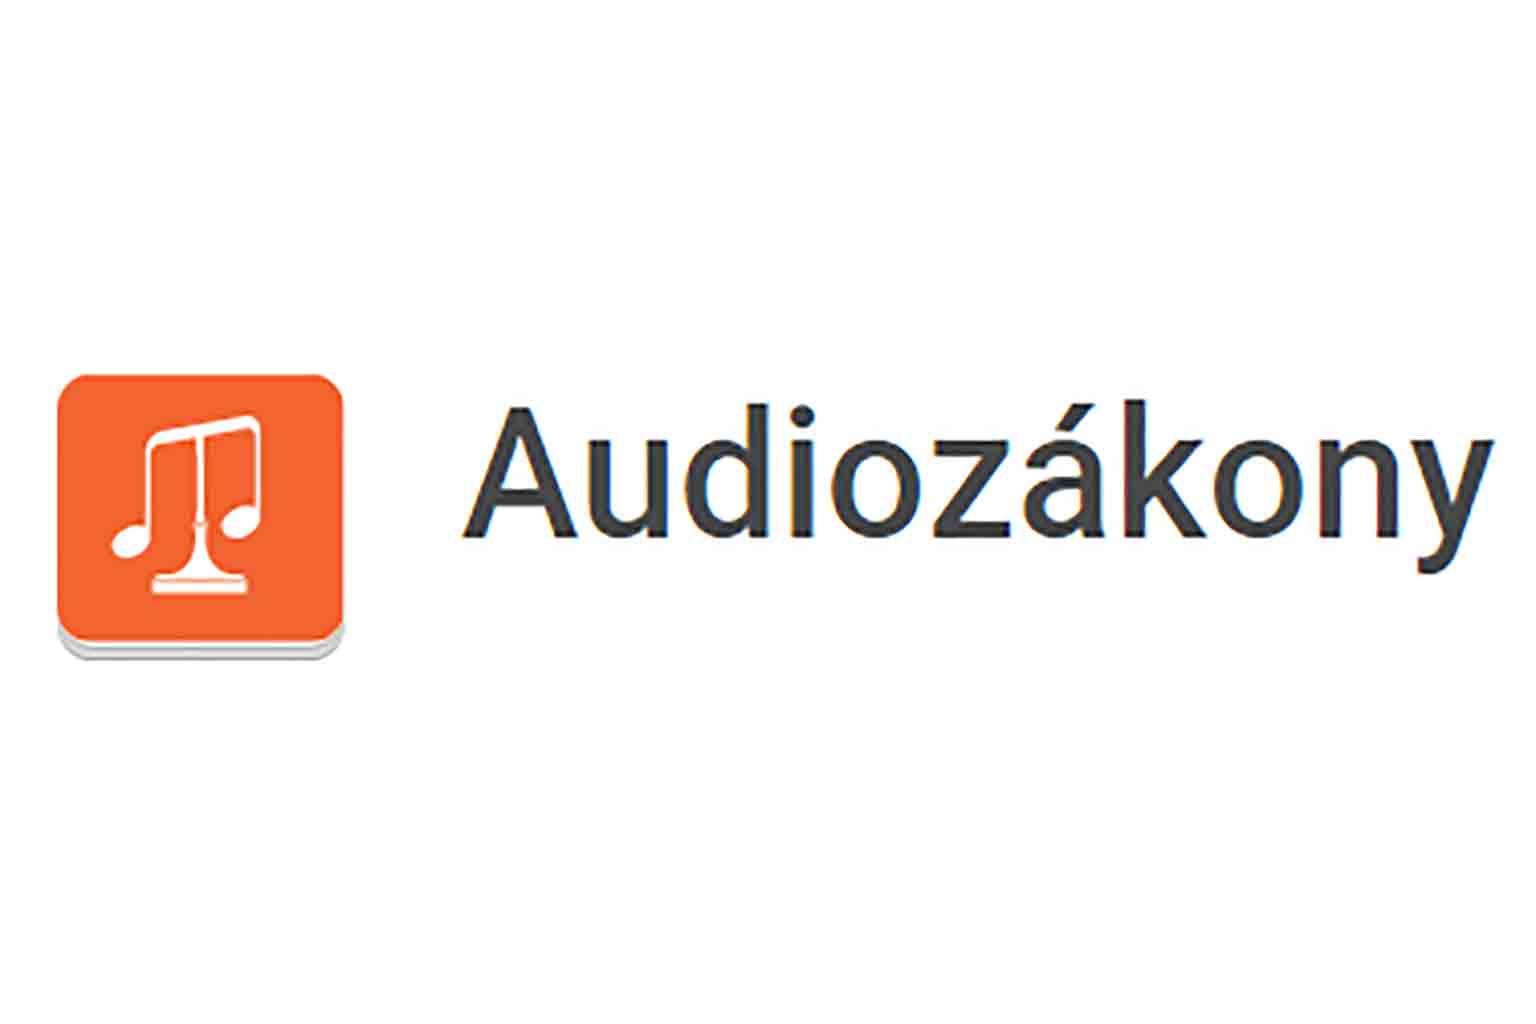 audiozakony